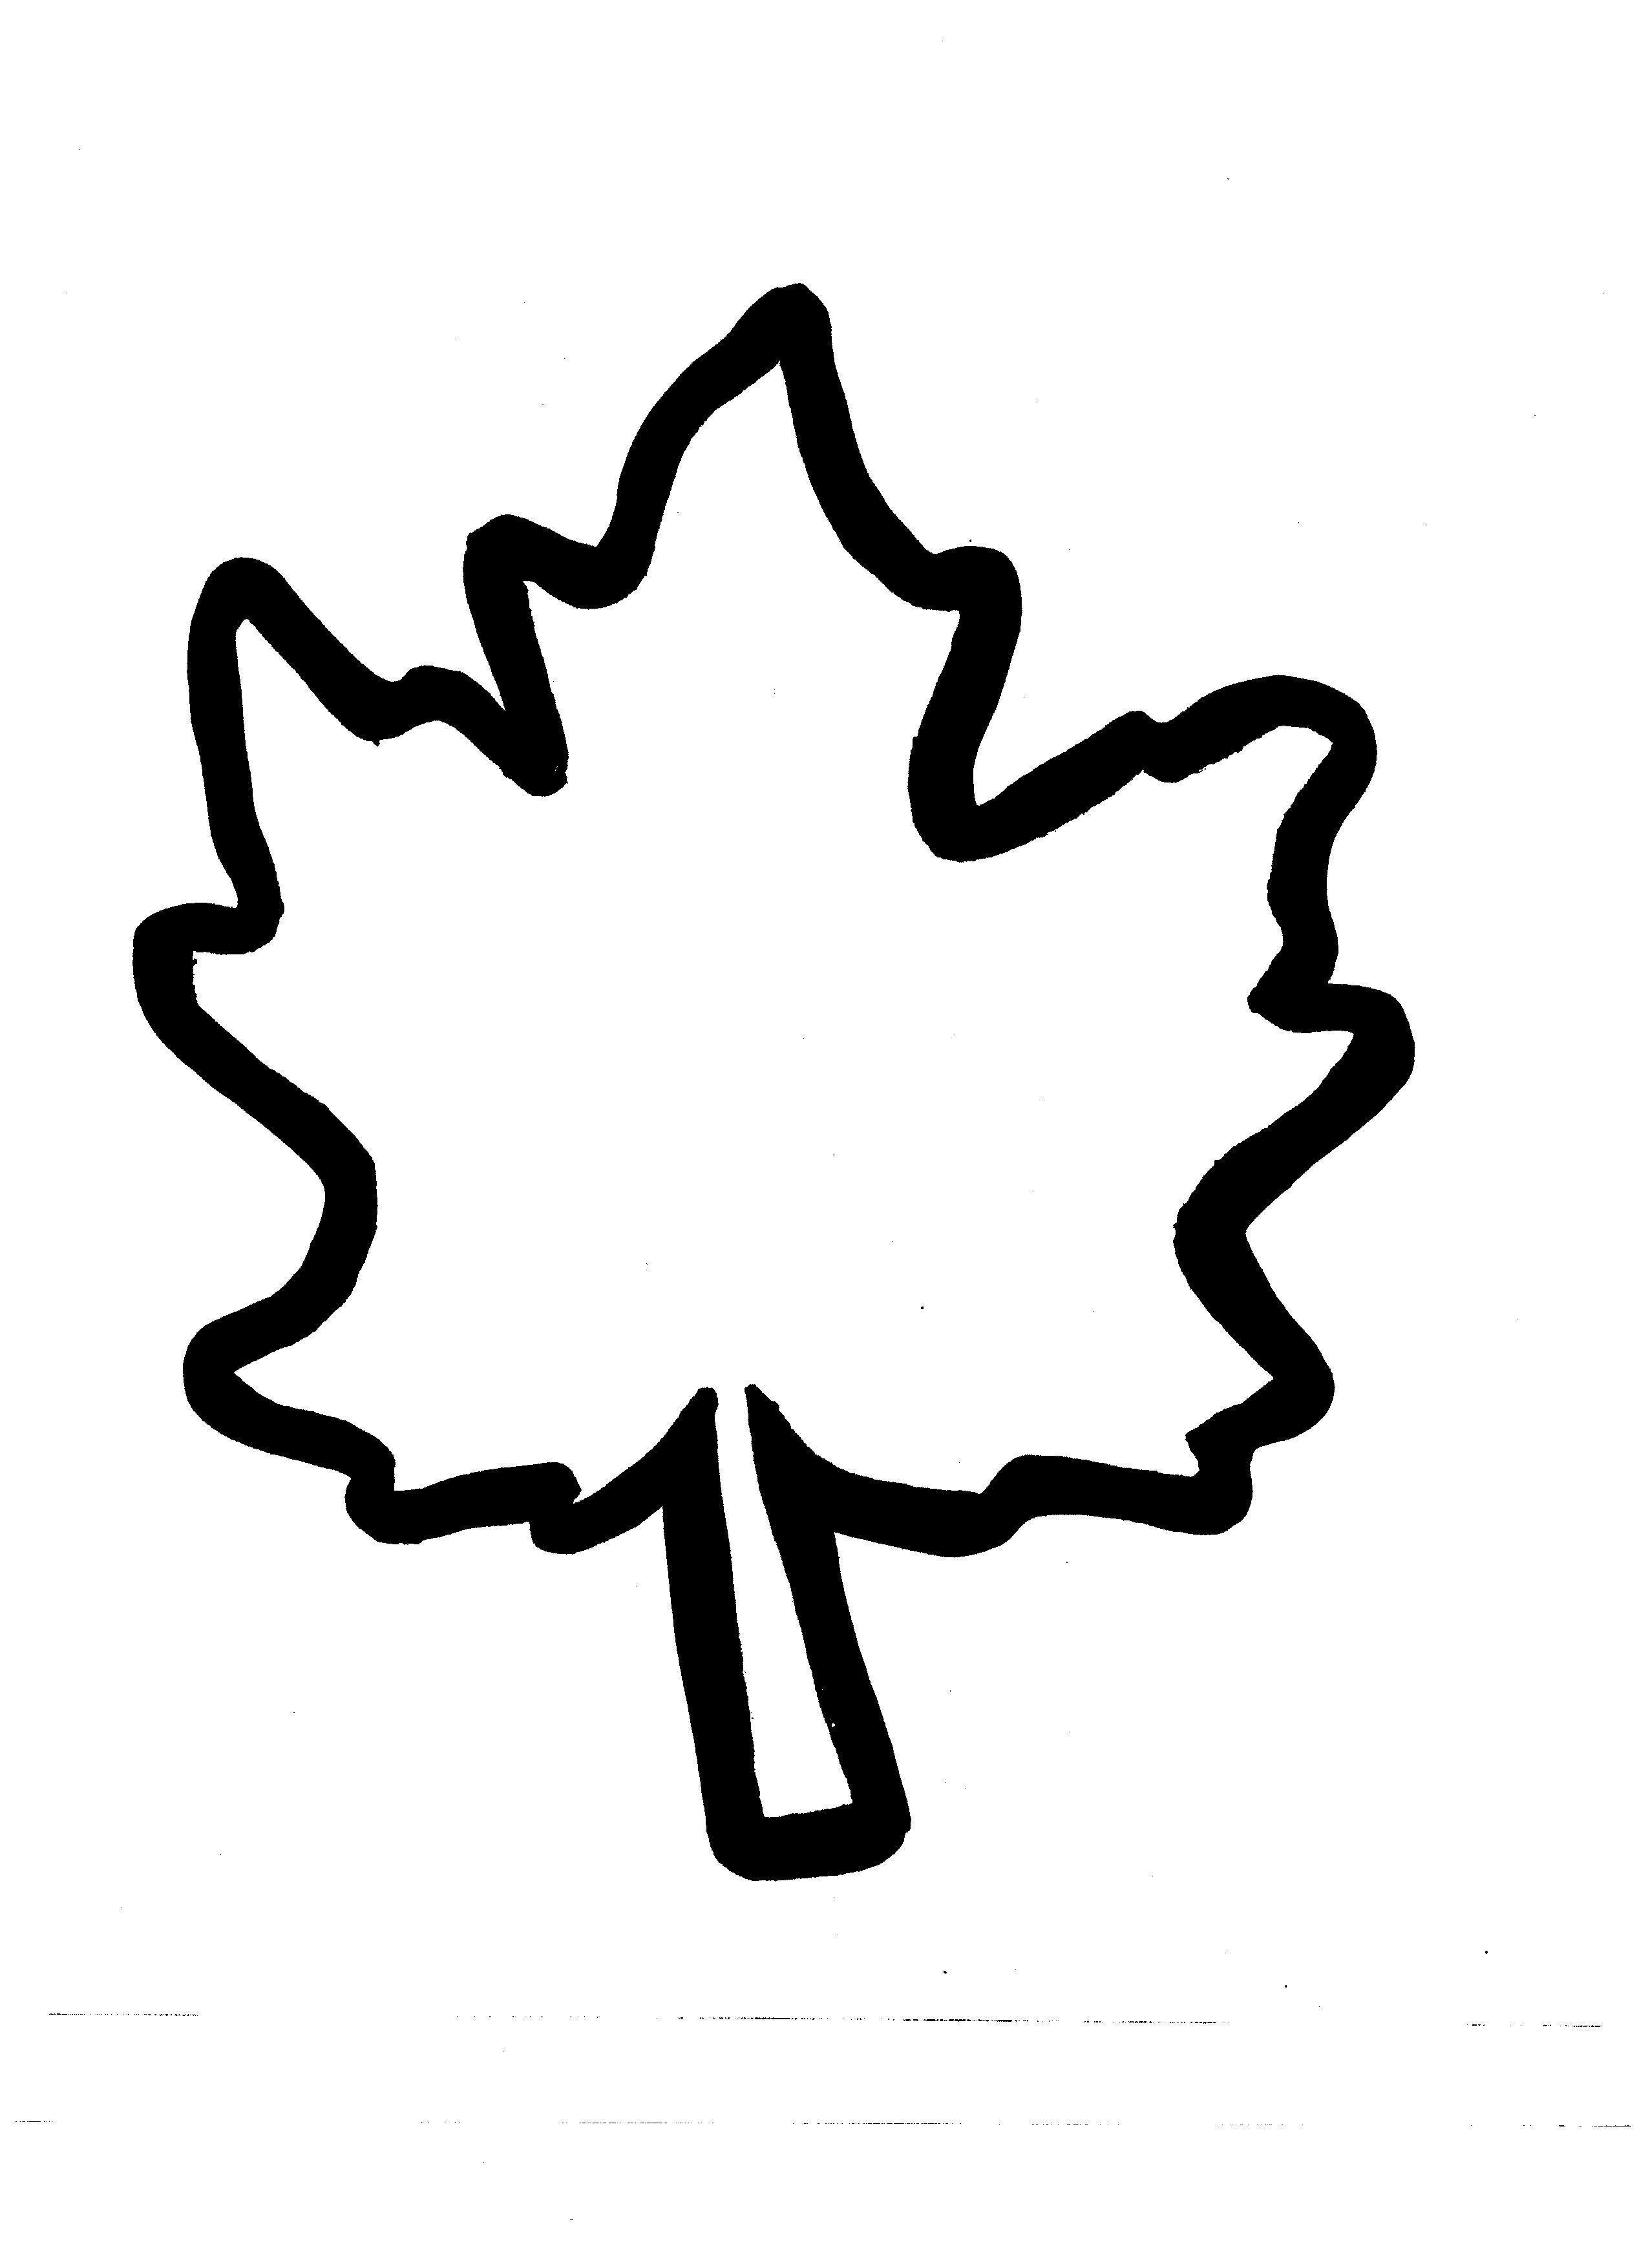 Autumn Leaf Outline - Cliparts.co